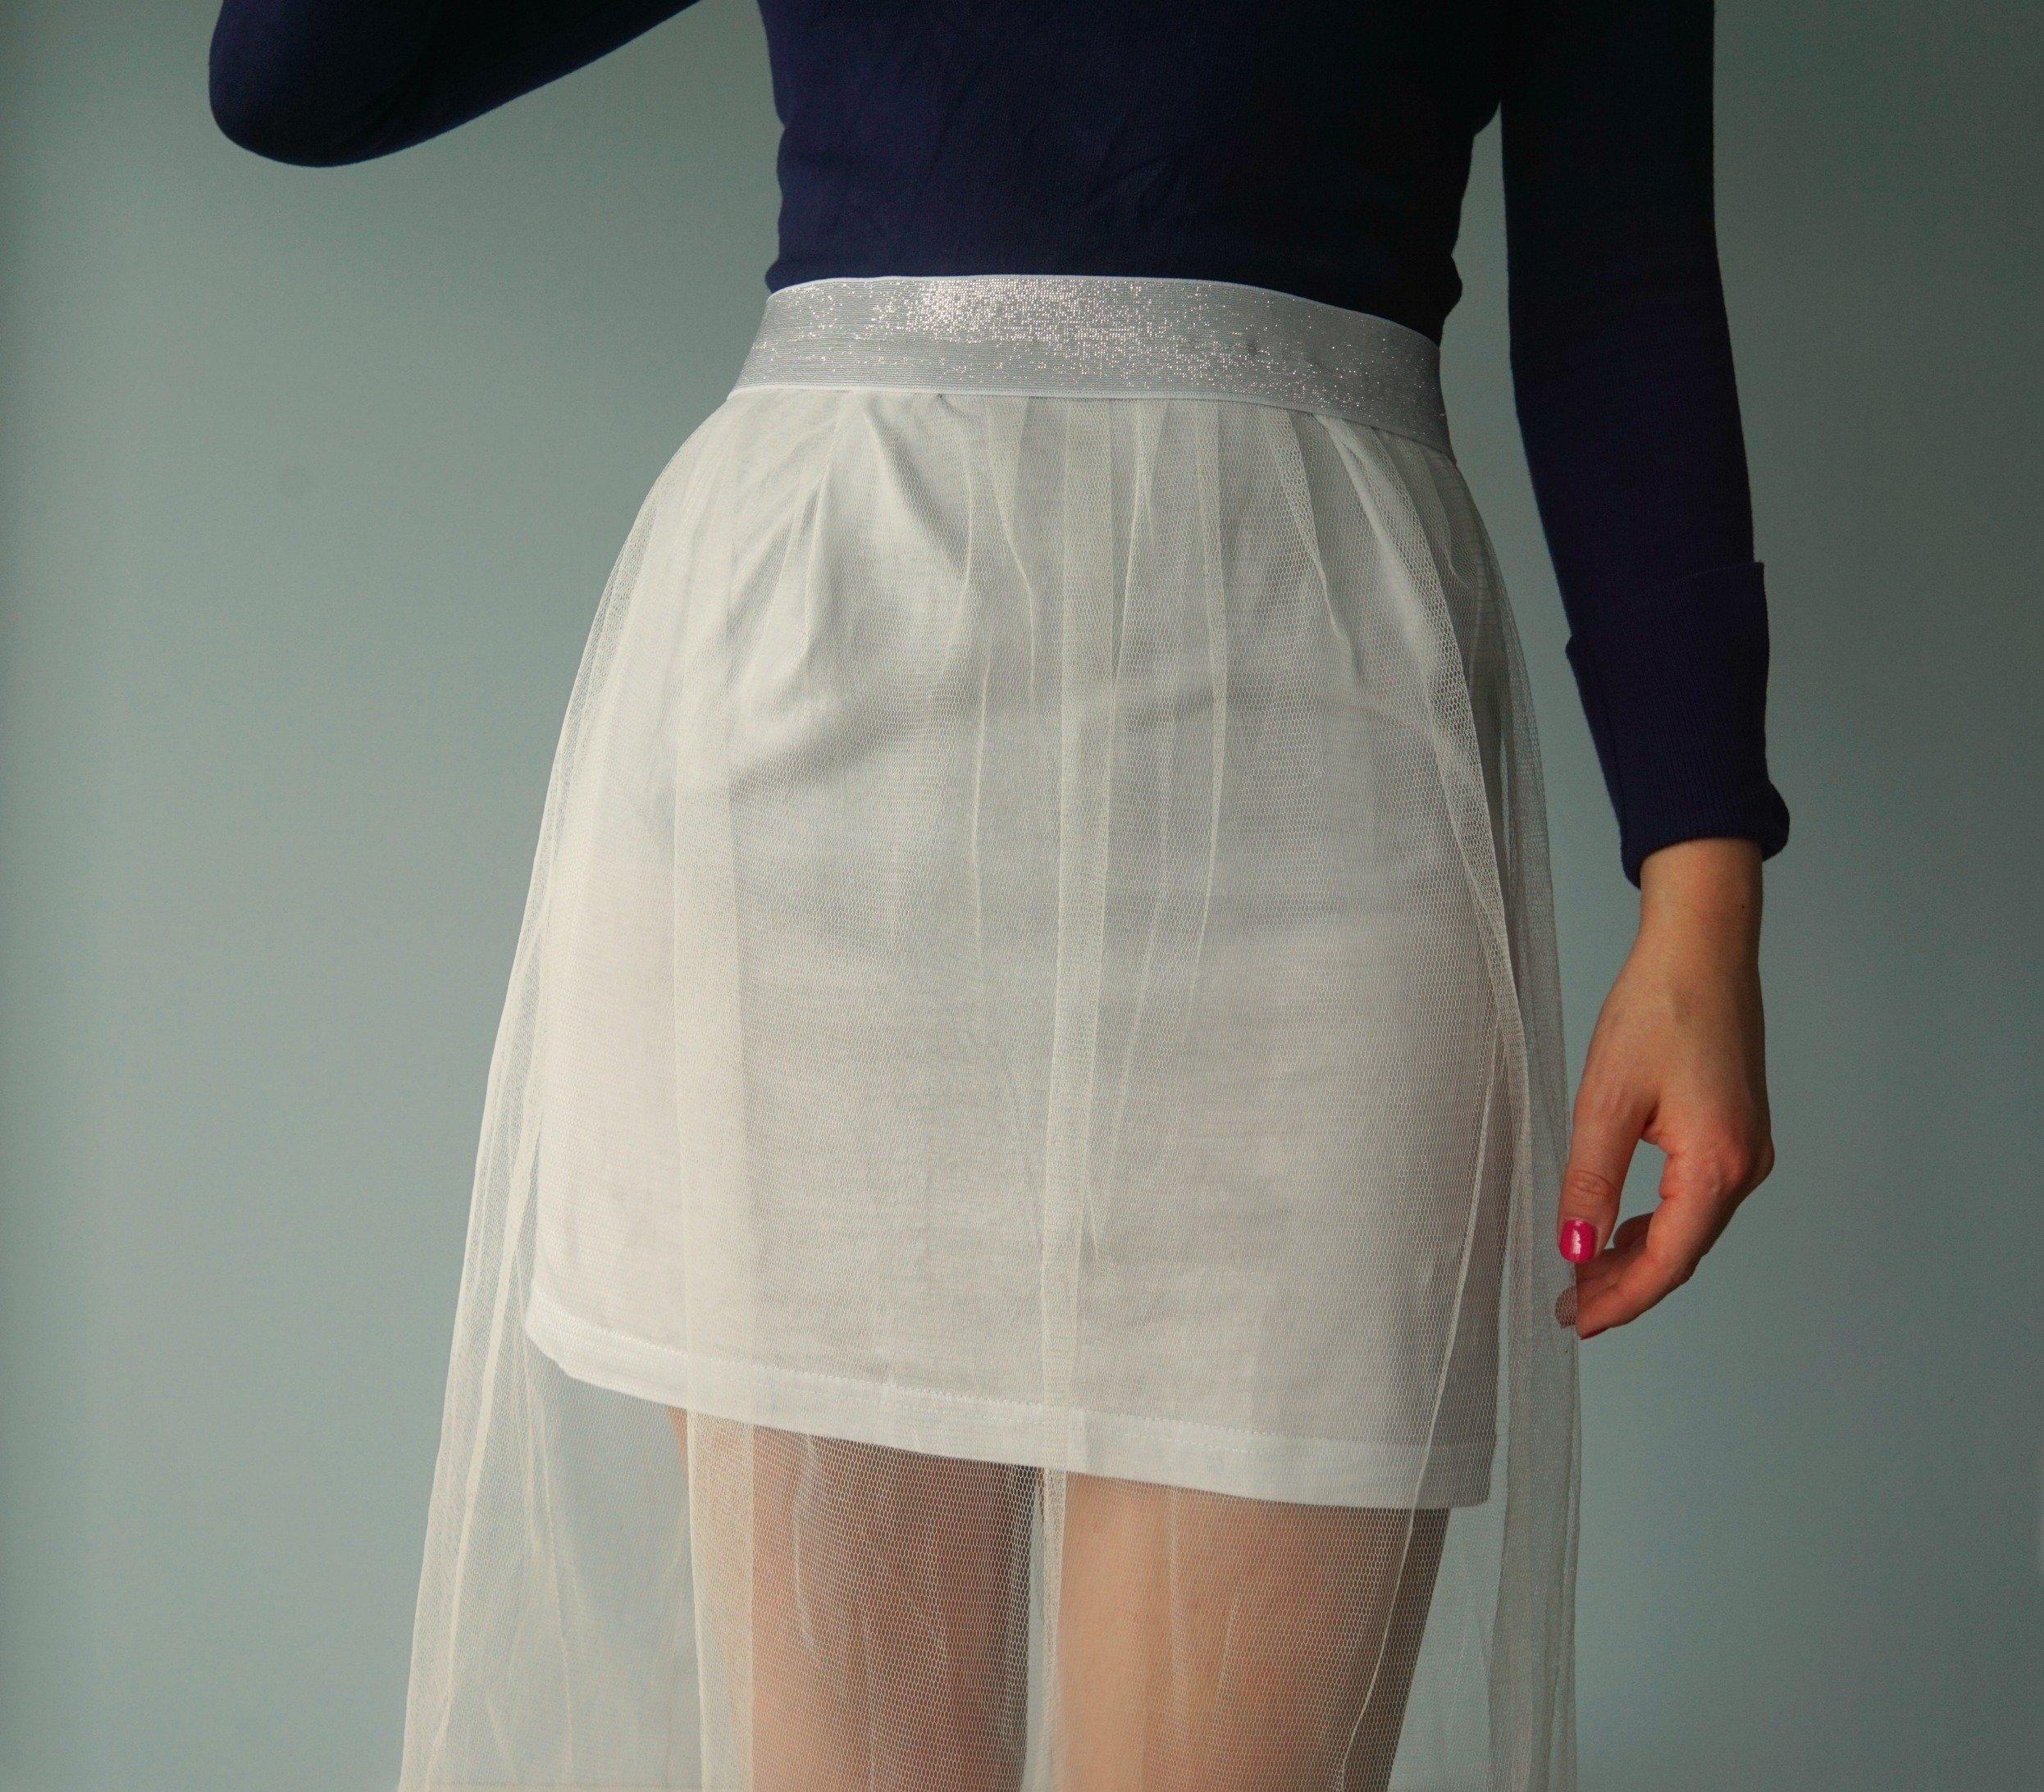 DIY Long Tulle Skirt {no math involved}